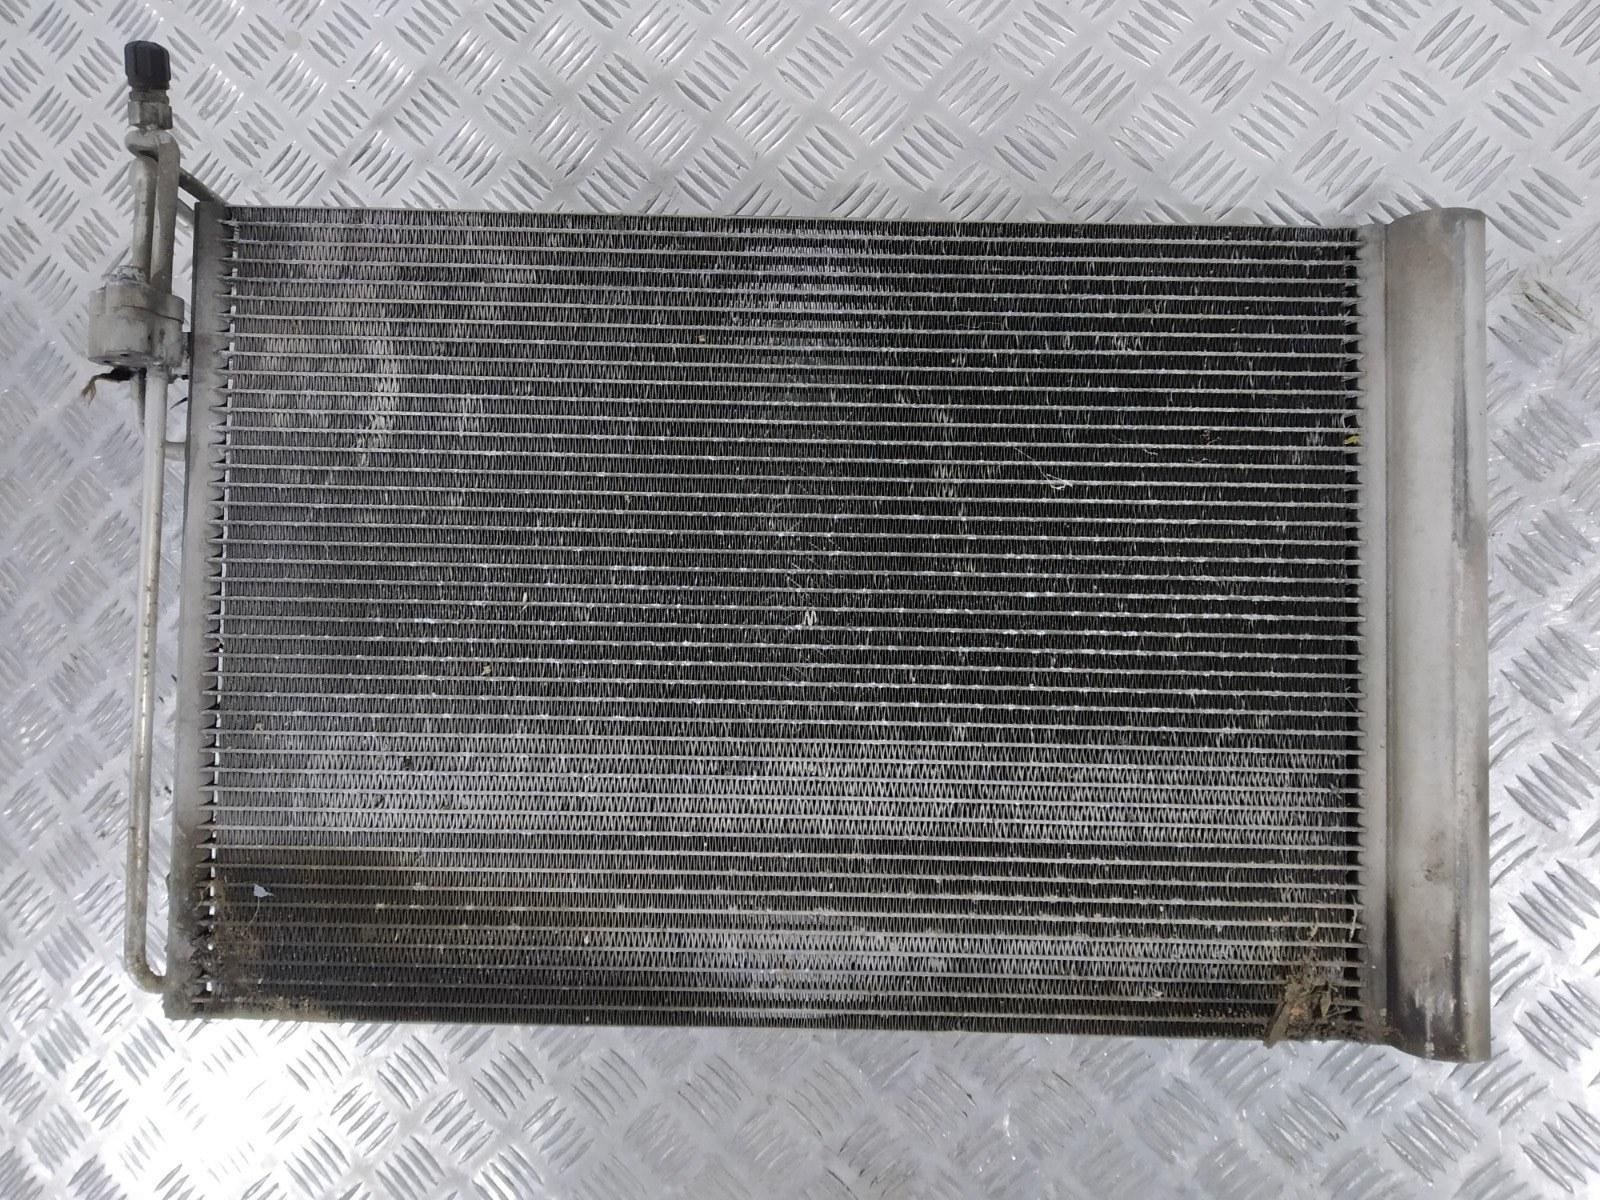 Радиатор кондиционера Bmw 5 E60 2.5 I 2004 (б/у)